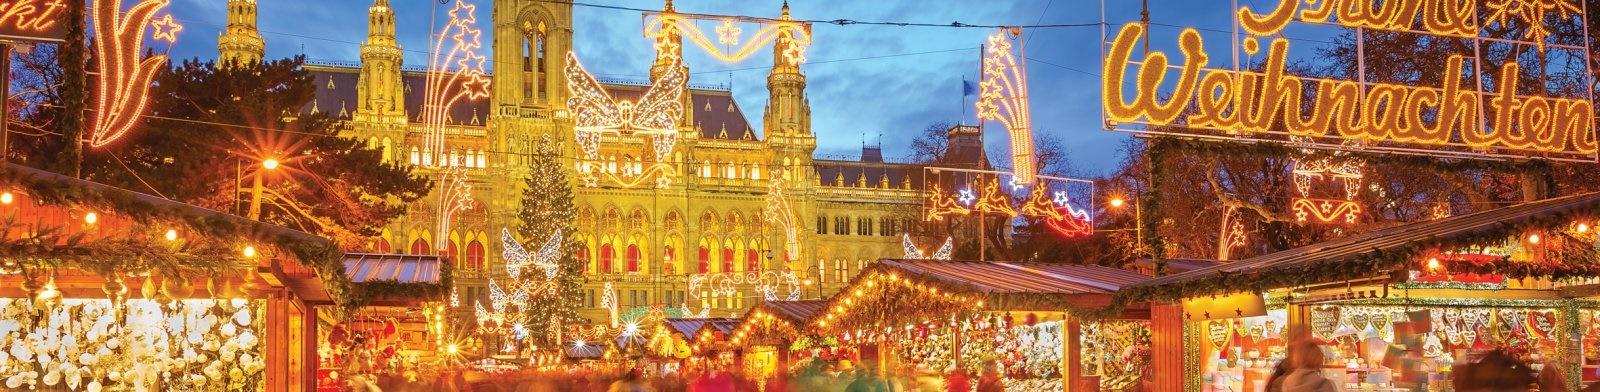 Vienna, Christmas Markets